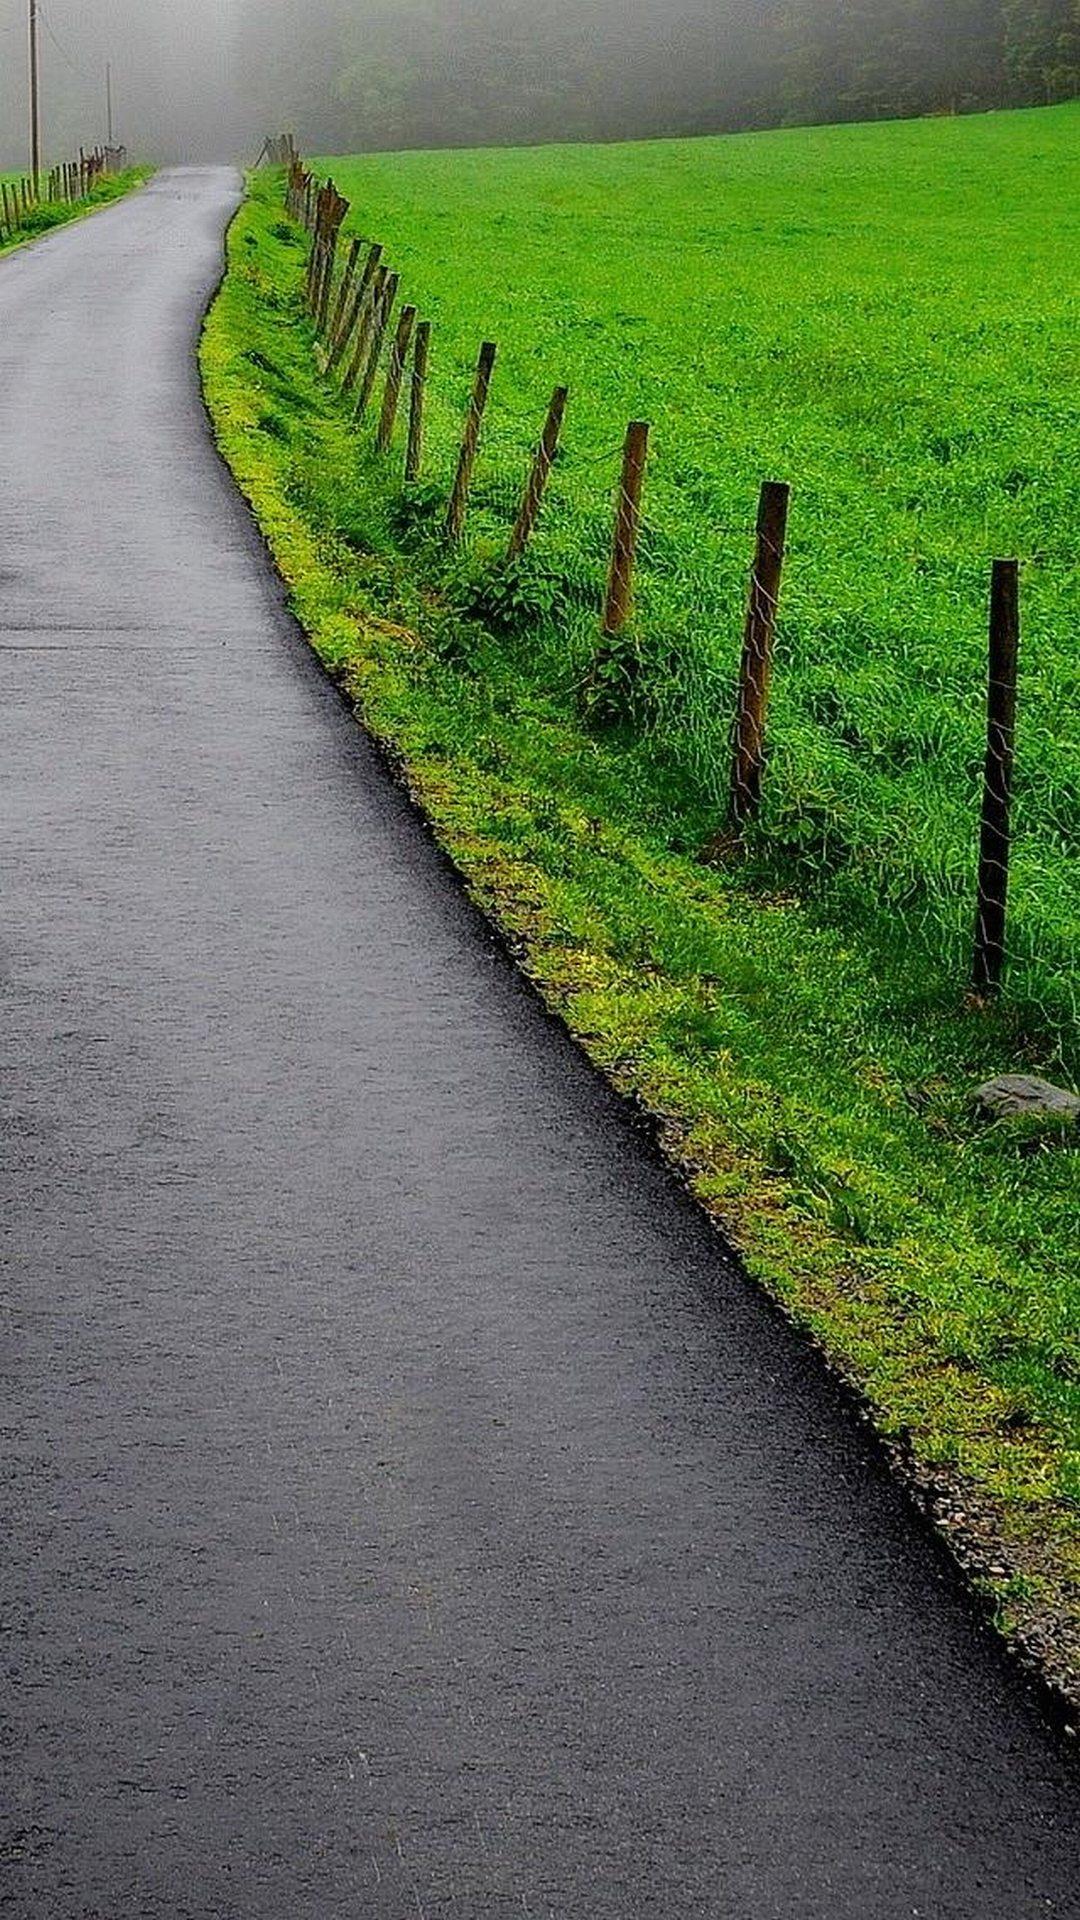 British country road